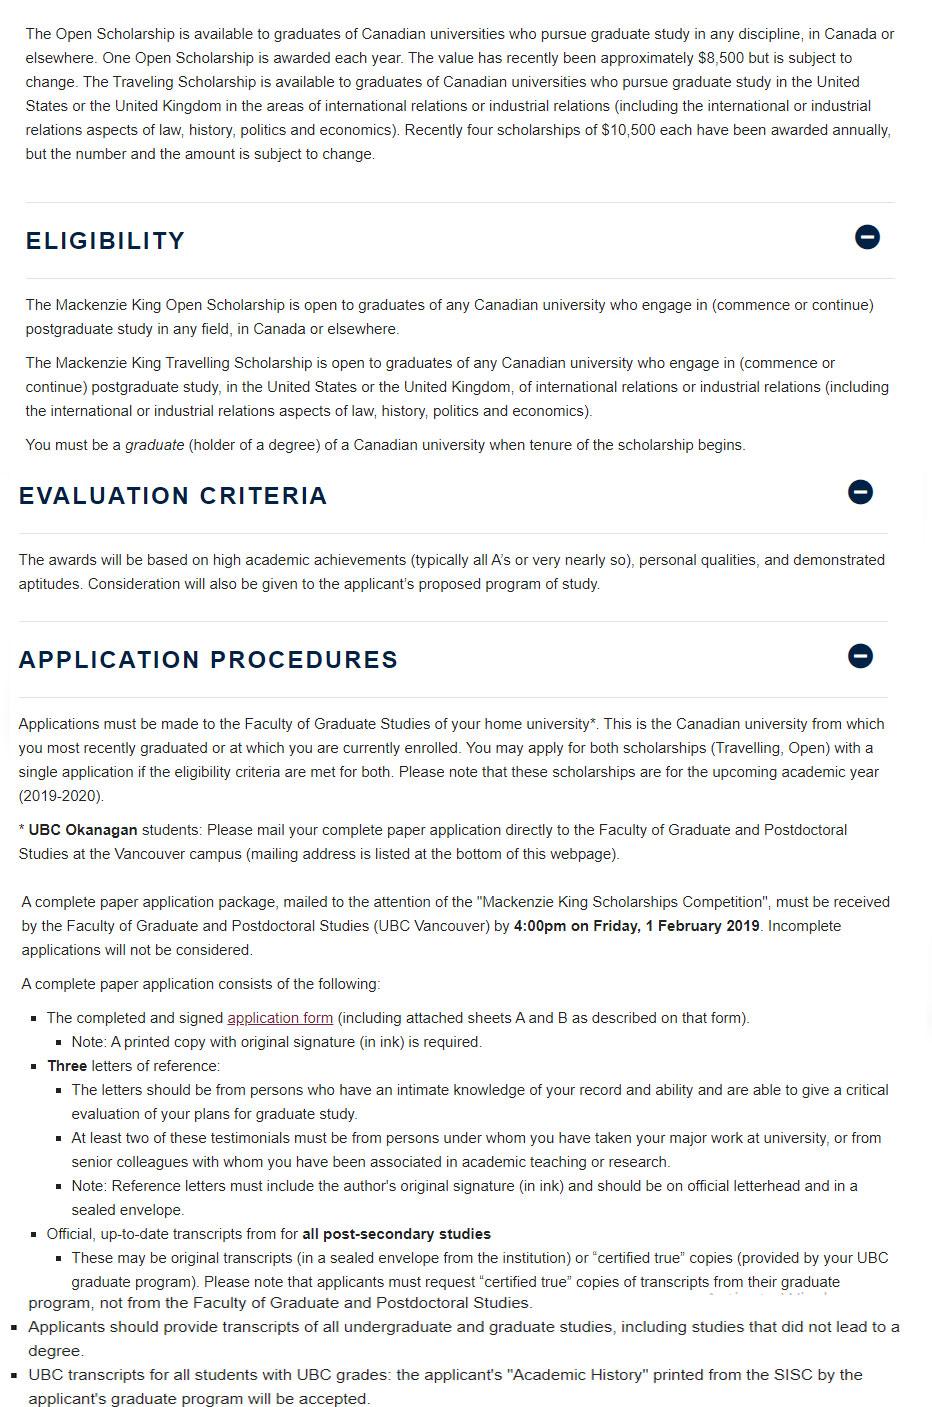 https://ishallwin.com/Content/ScholarshipImages/The-University-of-British-Columbia.jpg